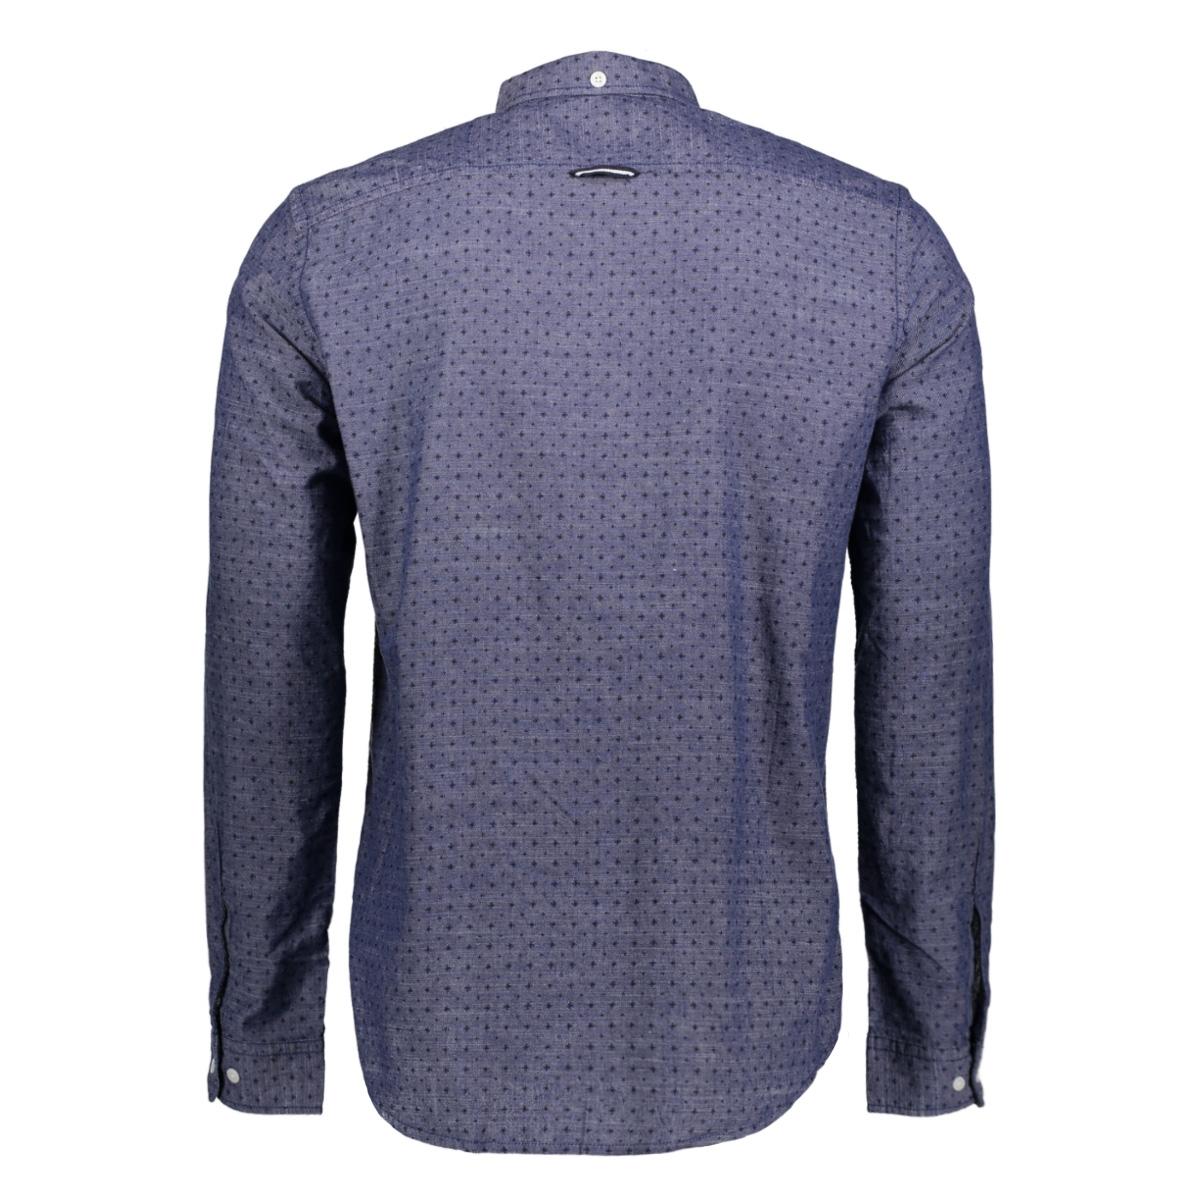 2055072.00.12 tom tailor overhemd 6740